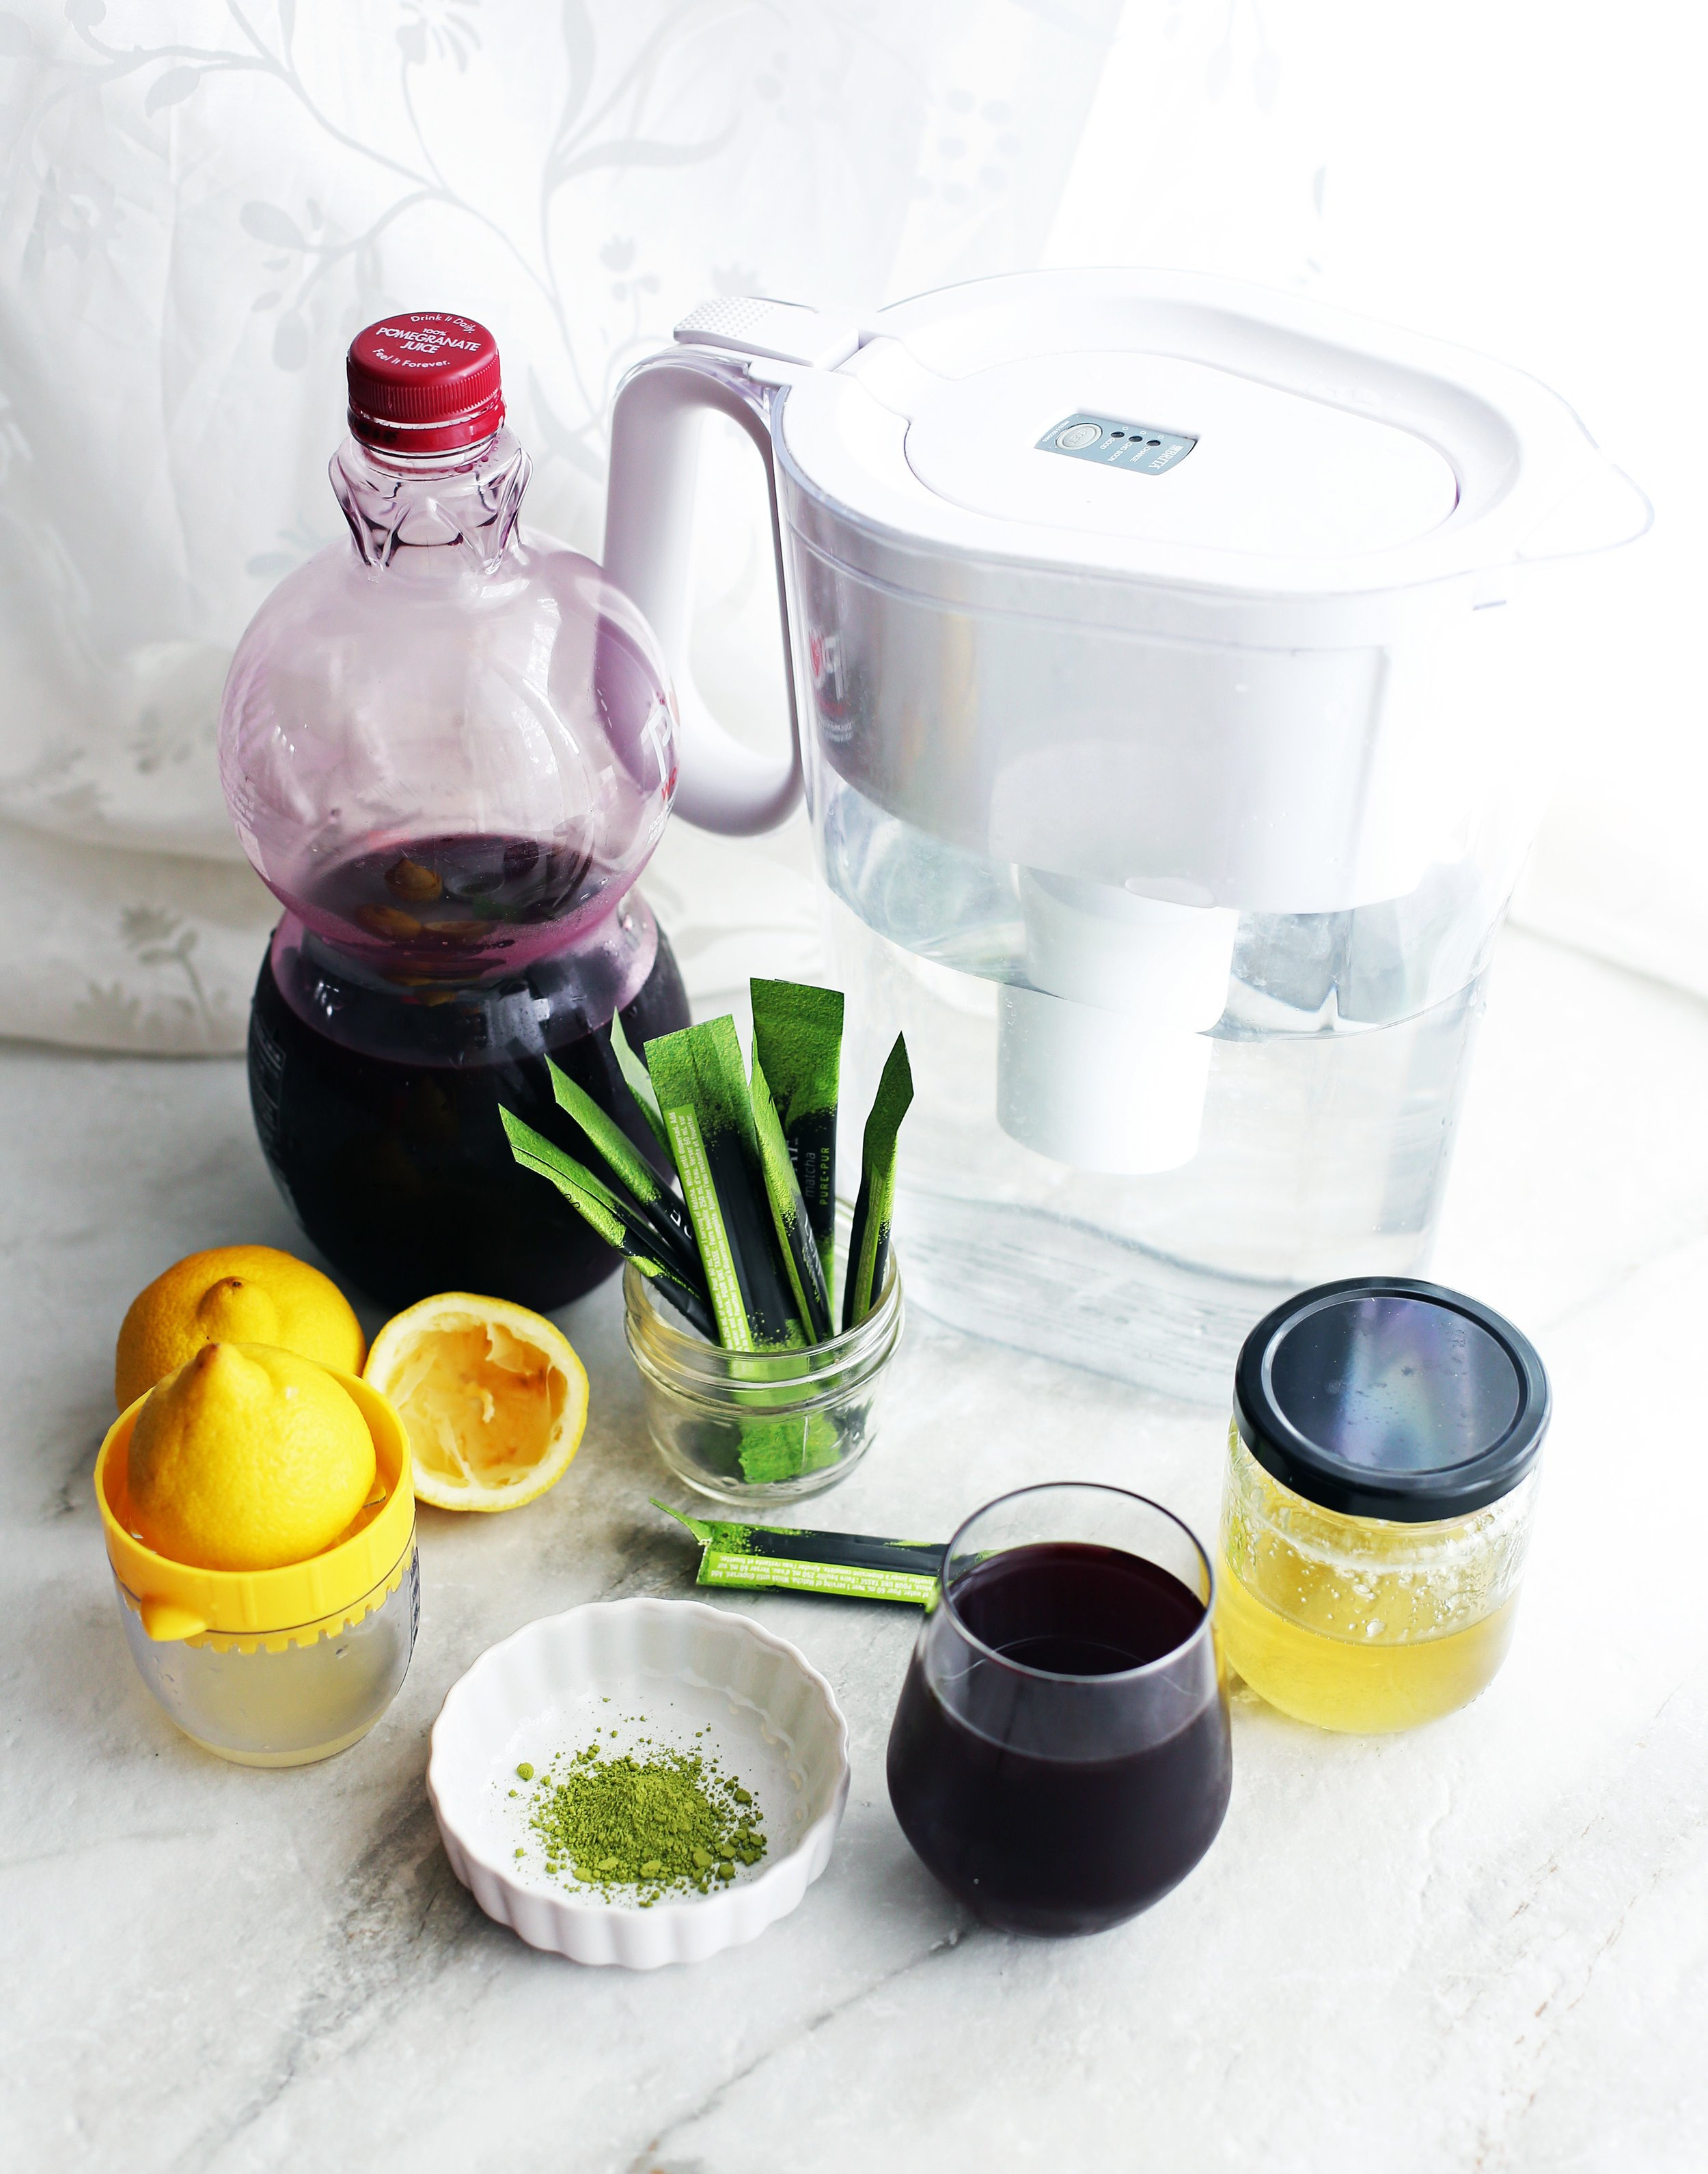 Pomegranate juice, matcha powder, lemon juice, honey, and water on a white surface.